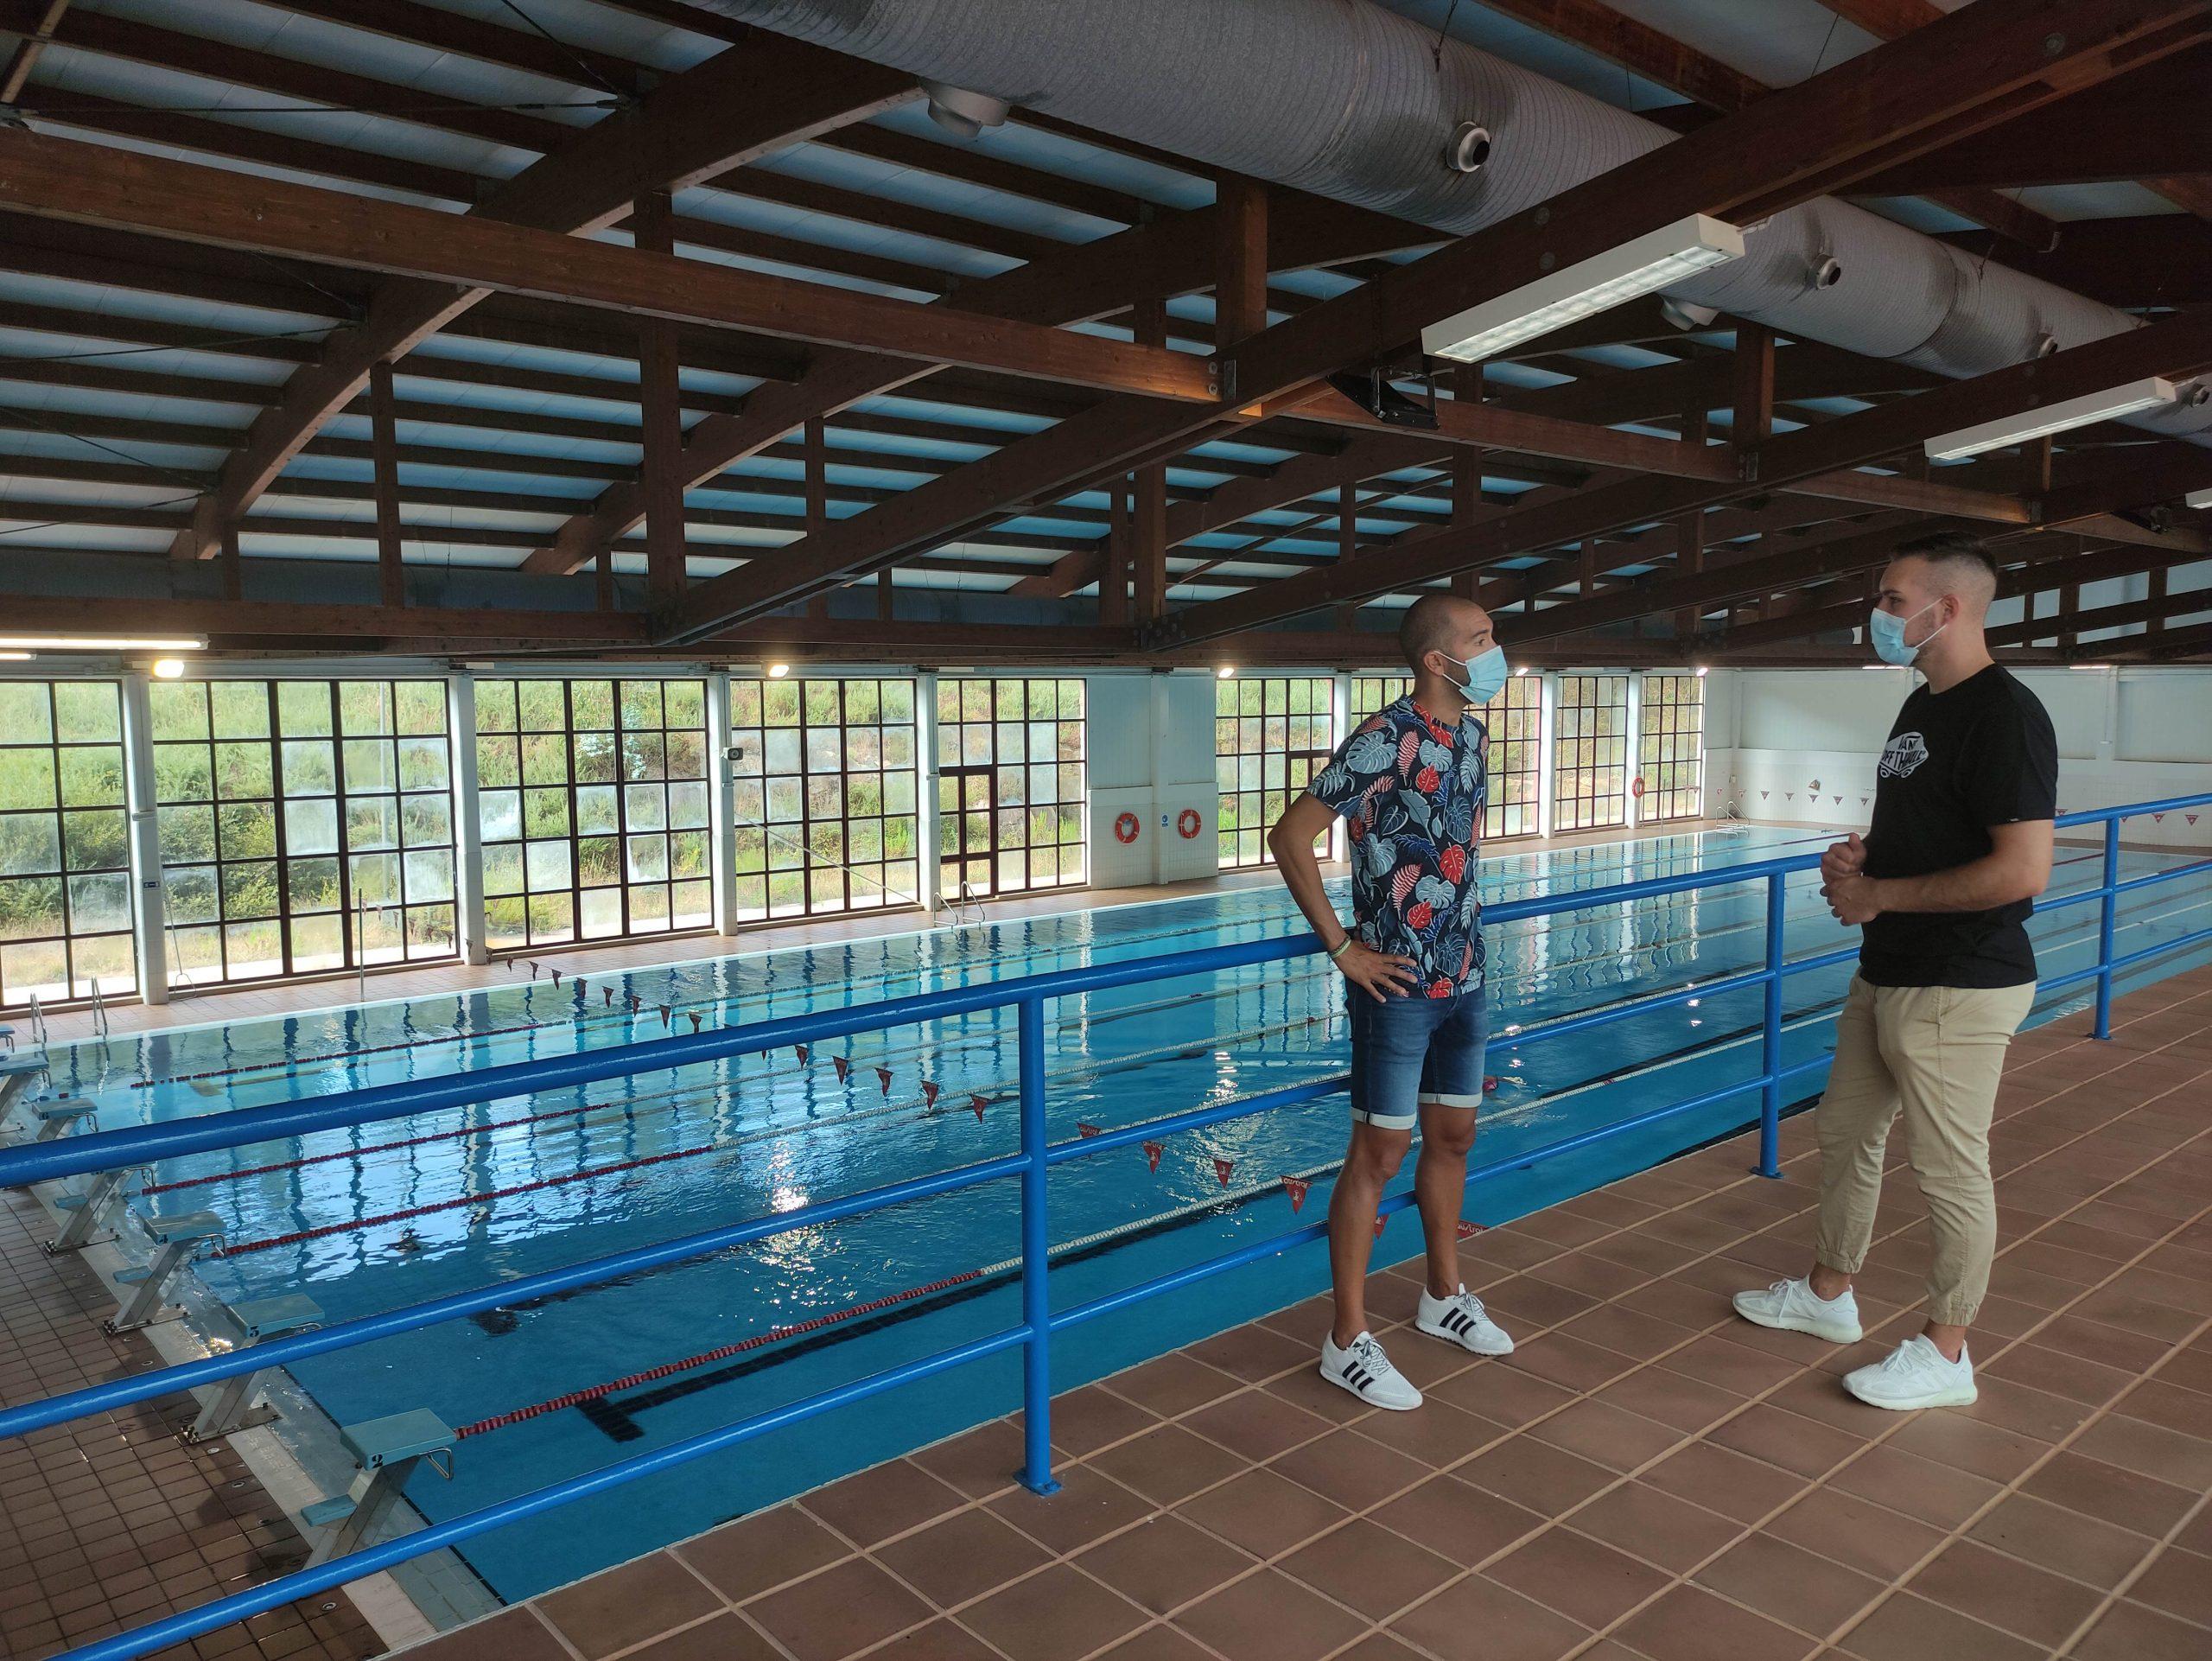 Reaberta a piscina olímpica municipal de Cervo